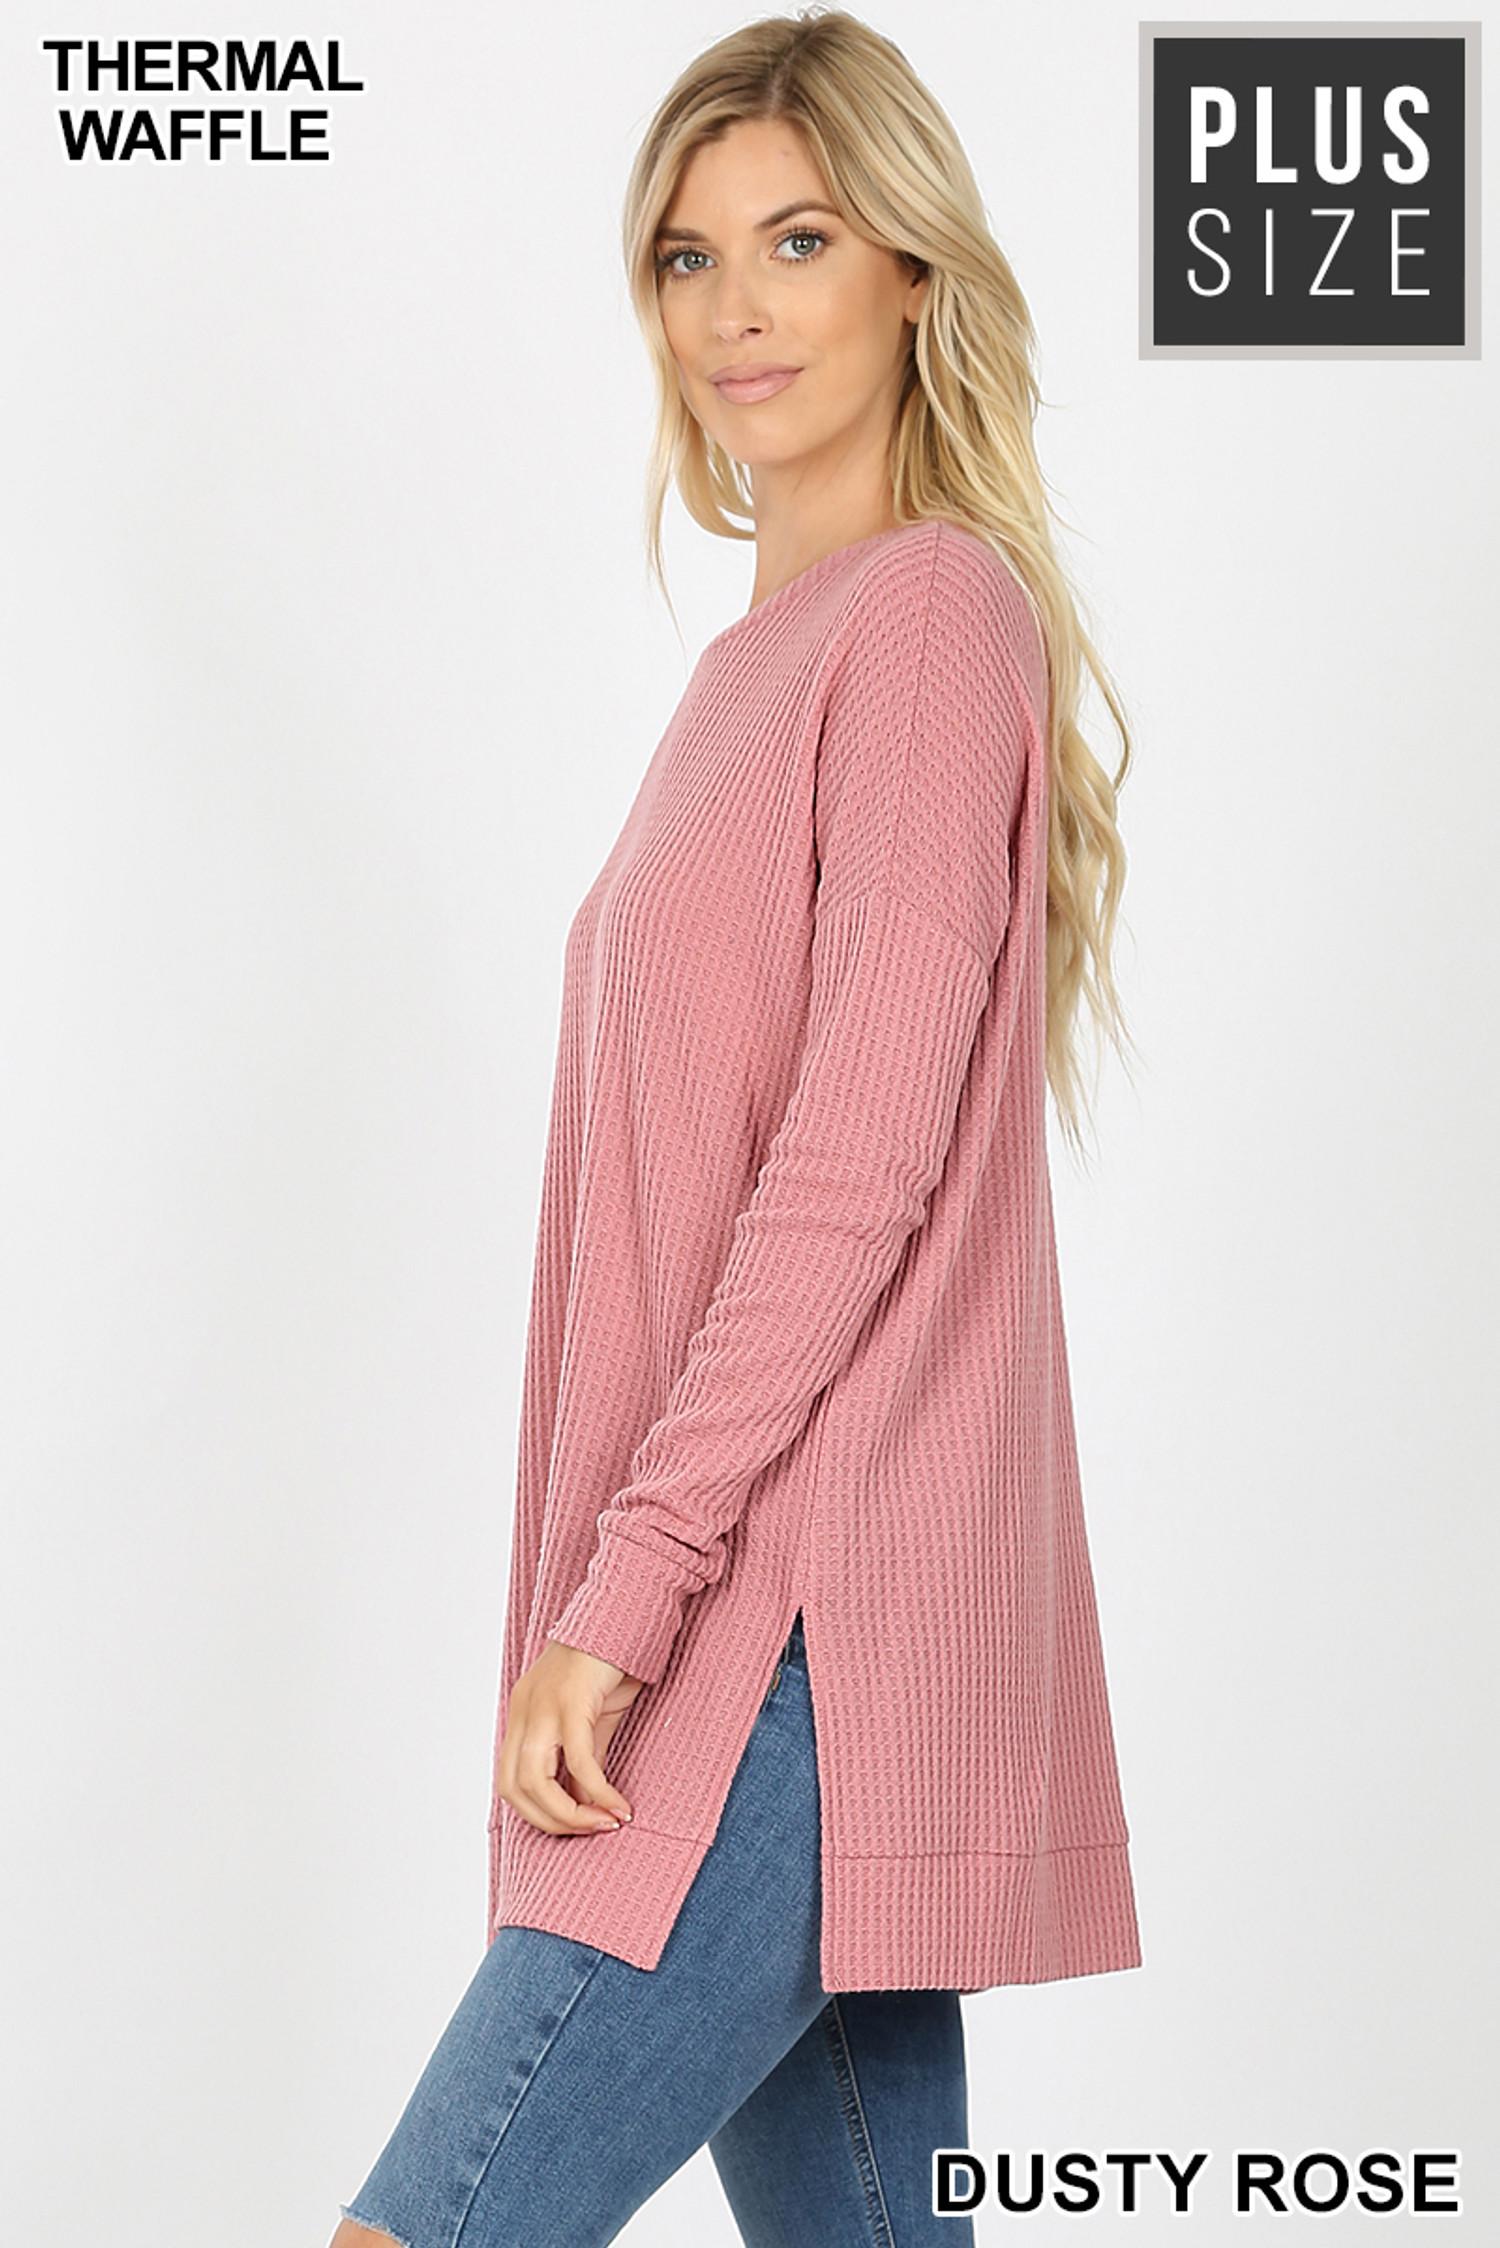 Left side image of Dusty Rose Brushed Thermal Waffle Knit Round Neck Plus Size Sweater